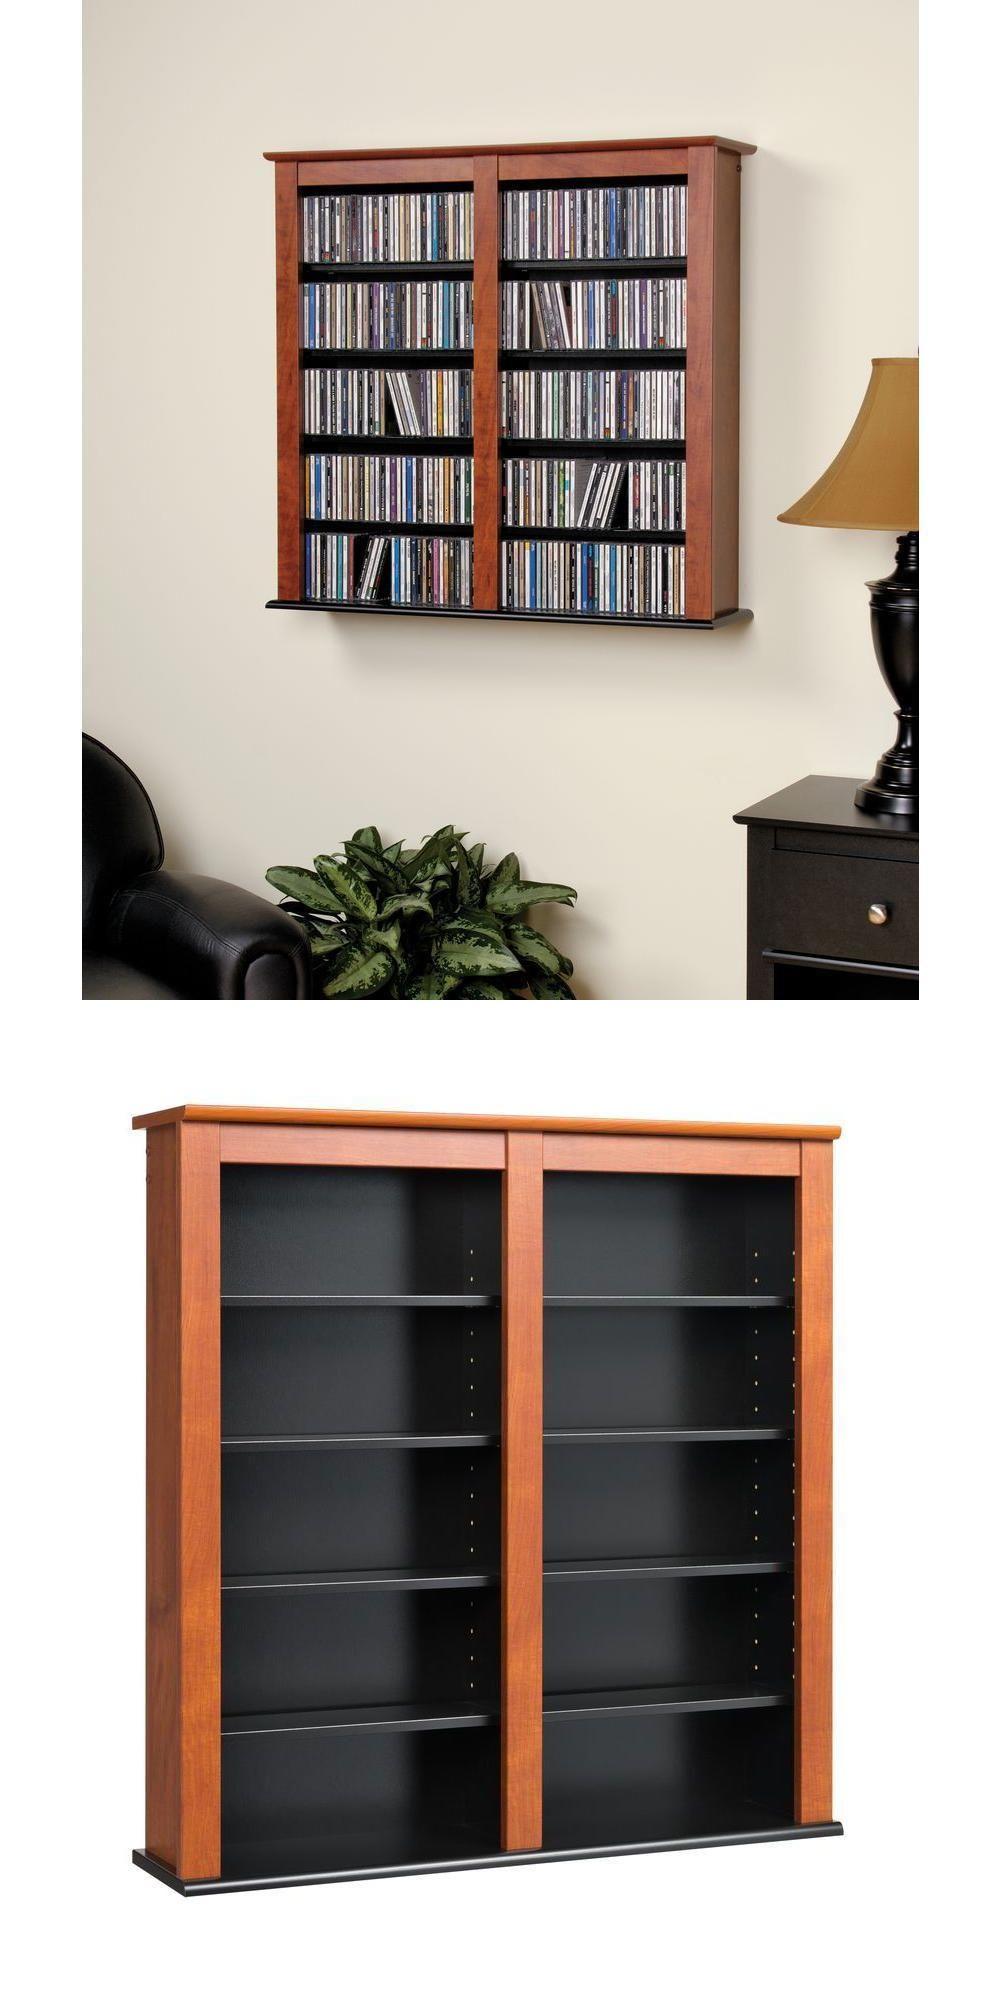 cd and video racks 22653 cherry media storage cabinet wall hanging rh pinterest com